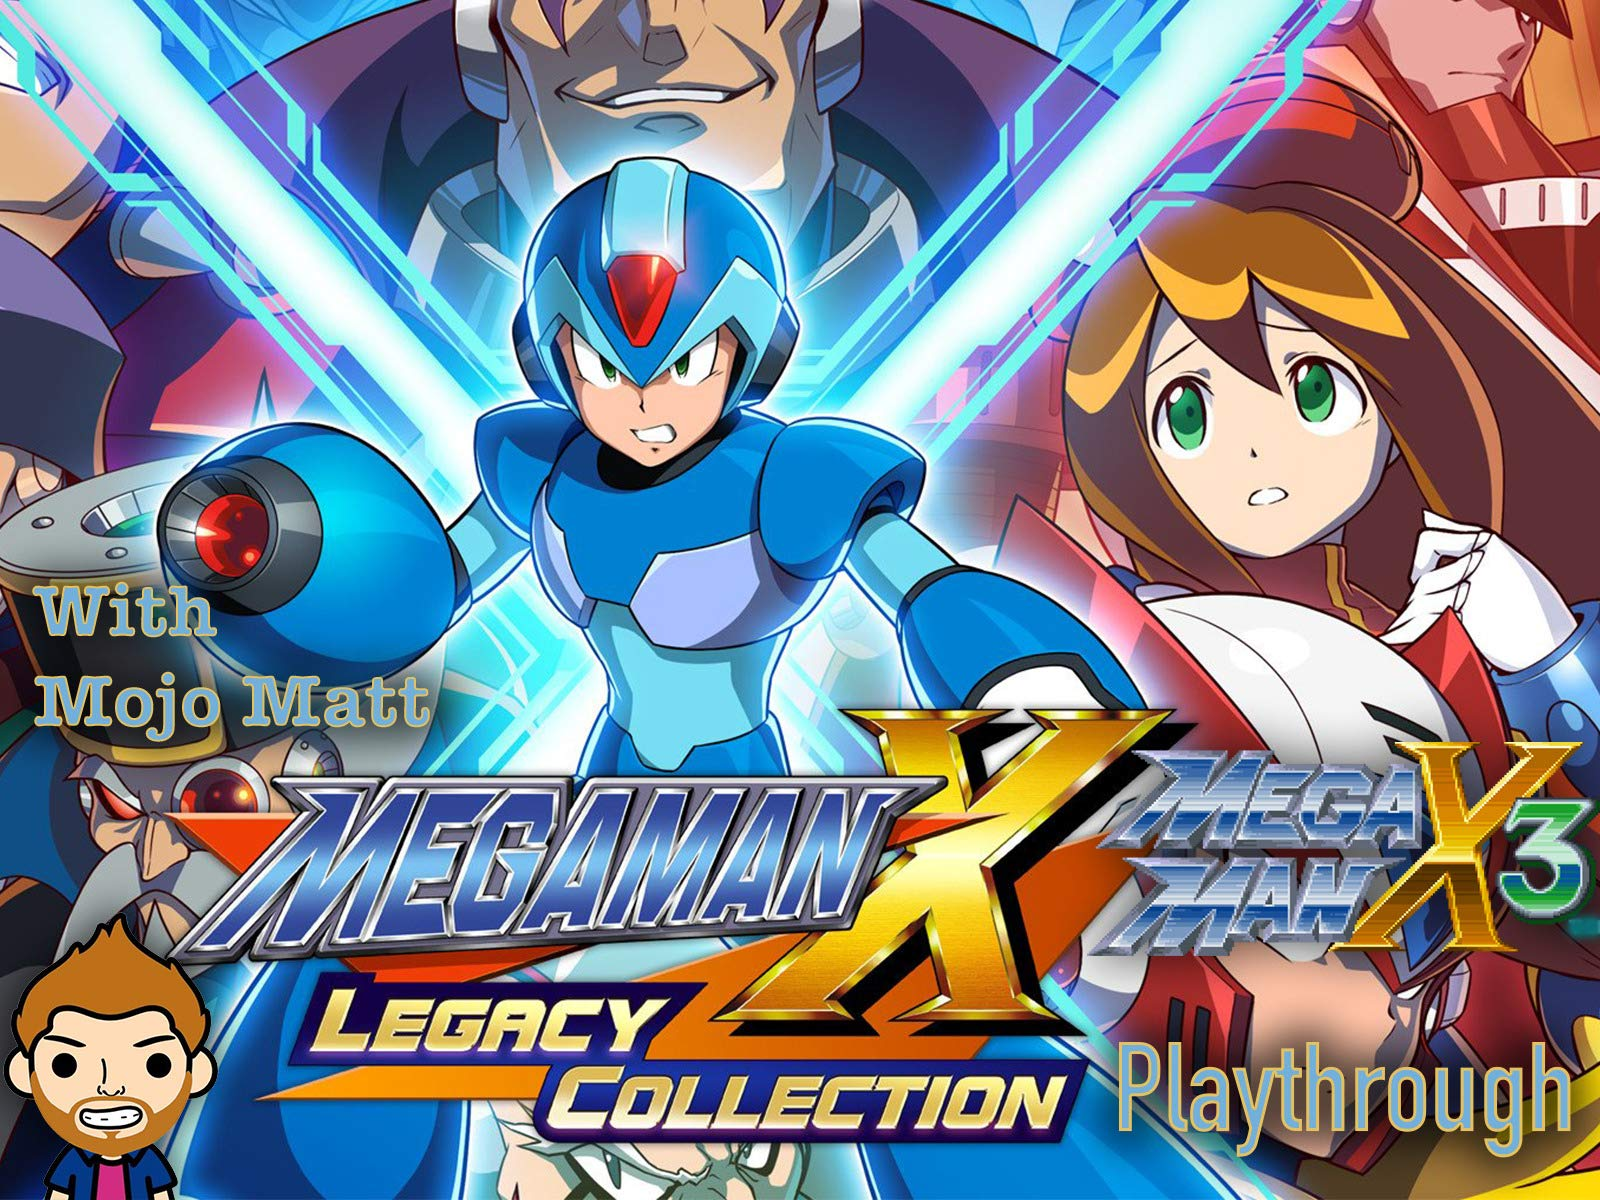 Maga Men X Legacy Collection Mega Man X3 Playthrough With Mojo Matt - Season 1